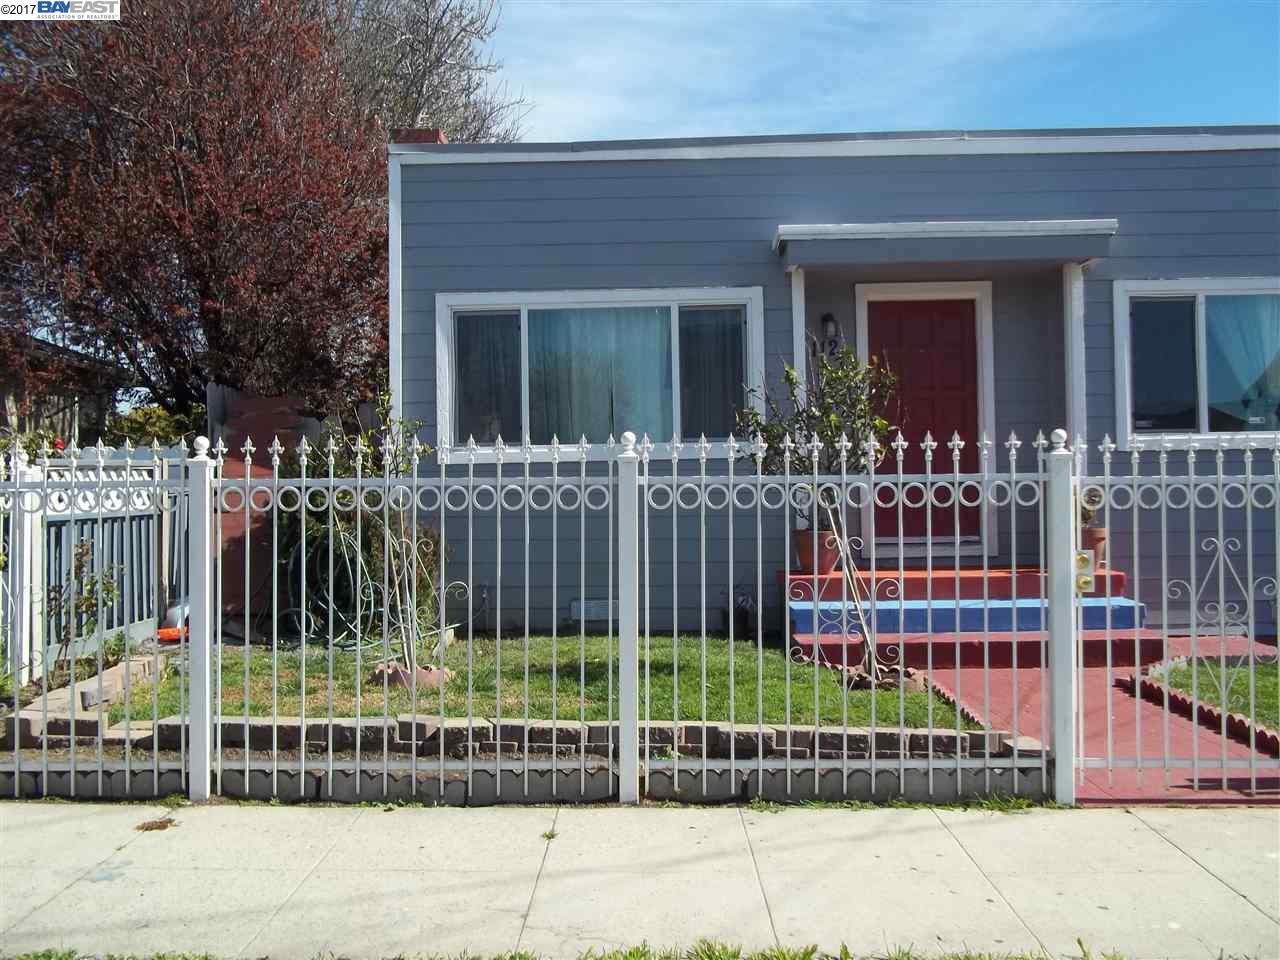 112 S 33RD ST, RICHMOND, CA 94804